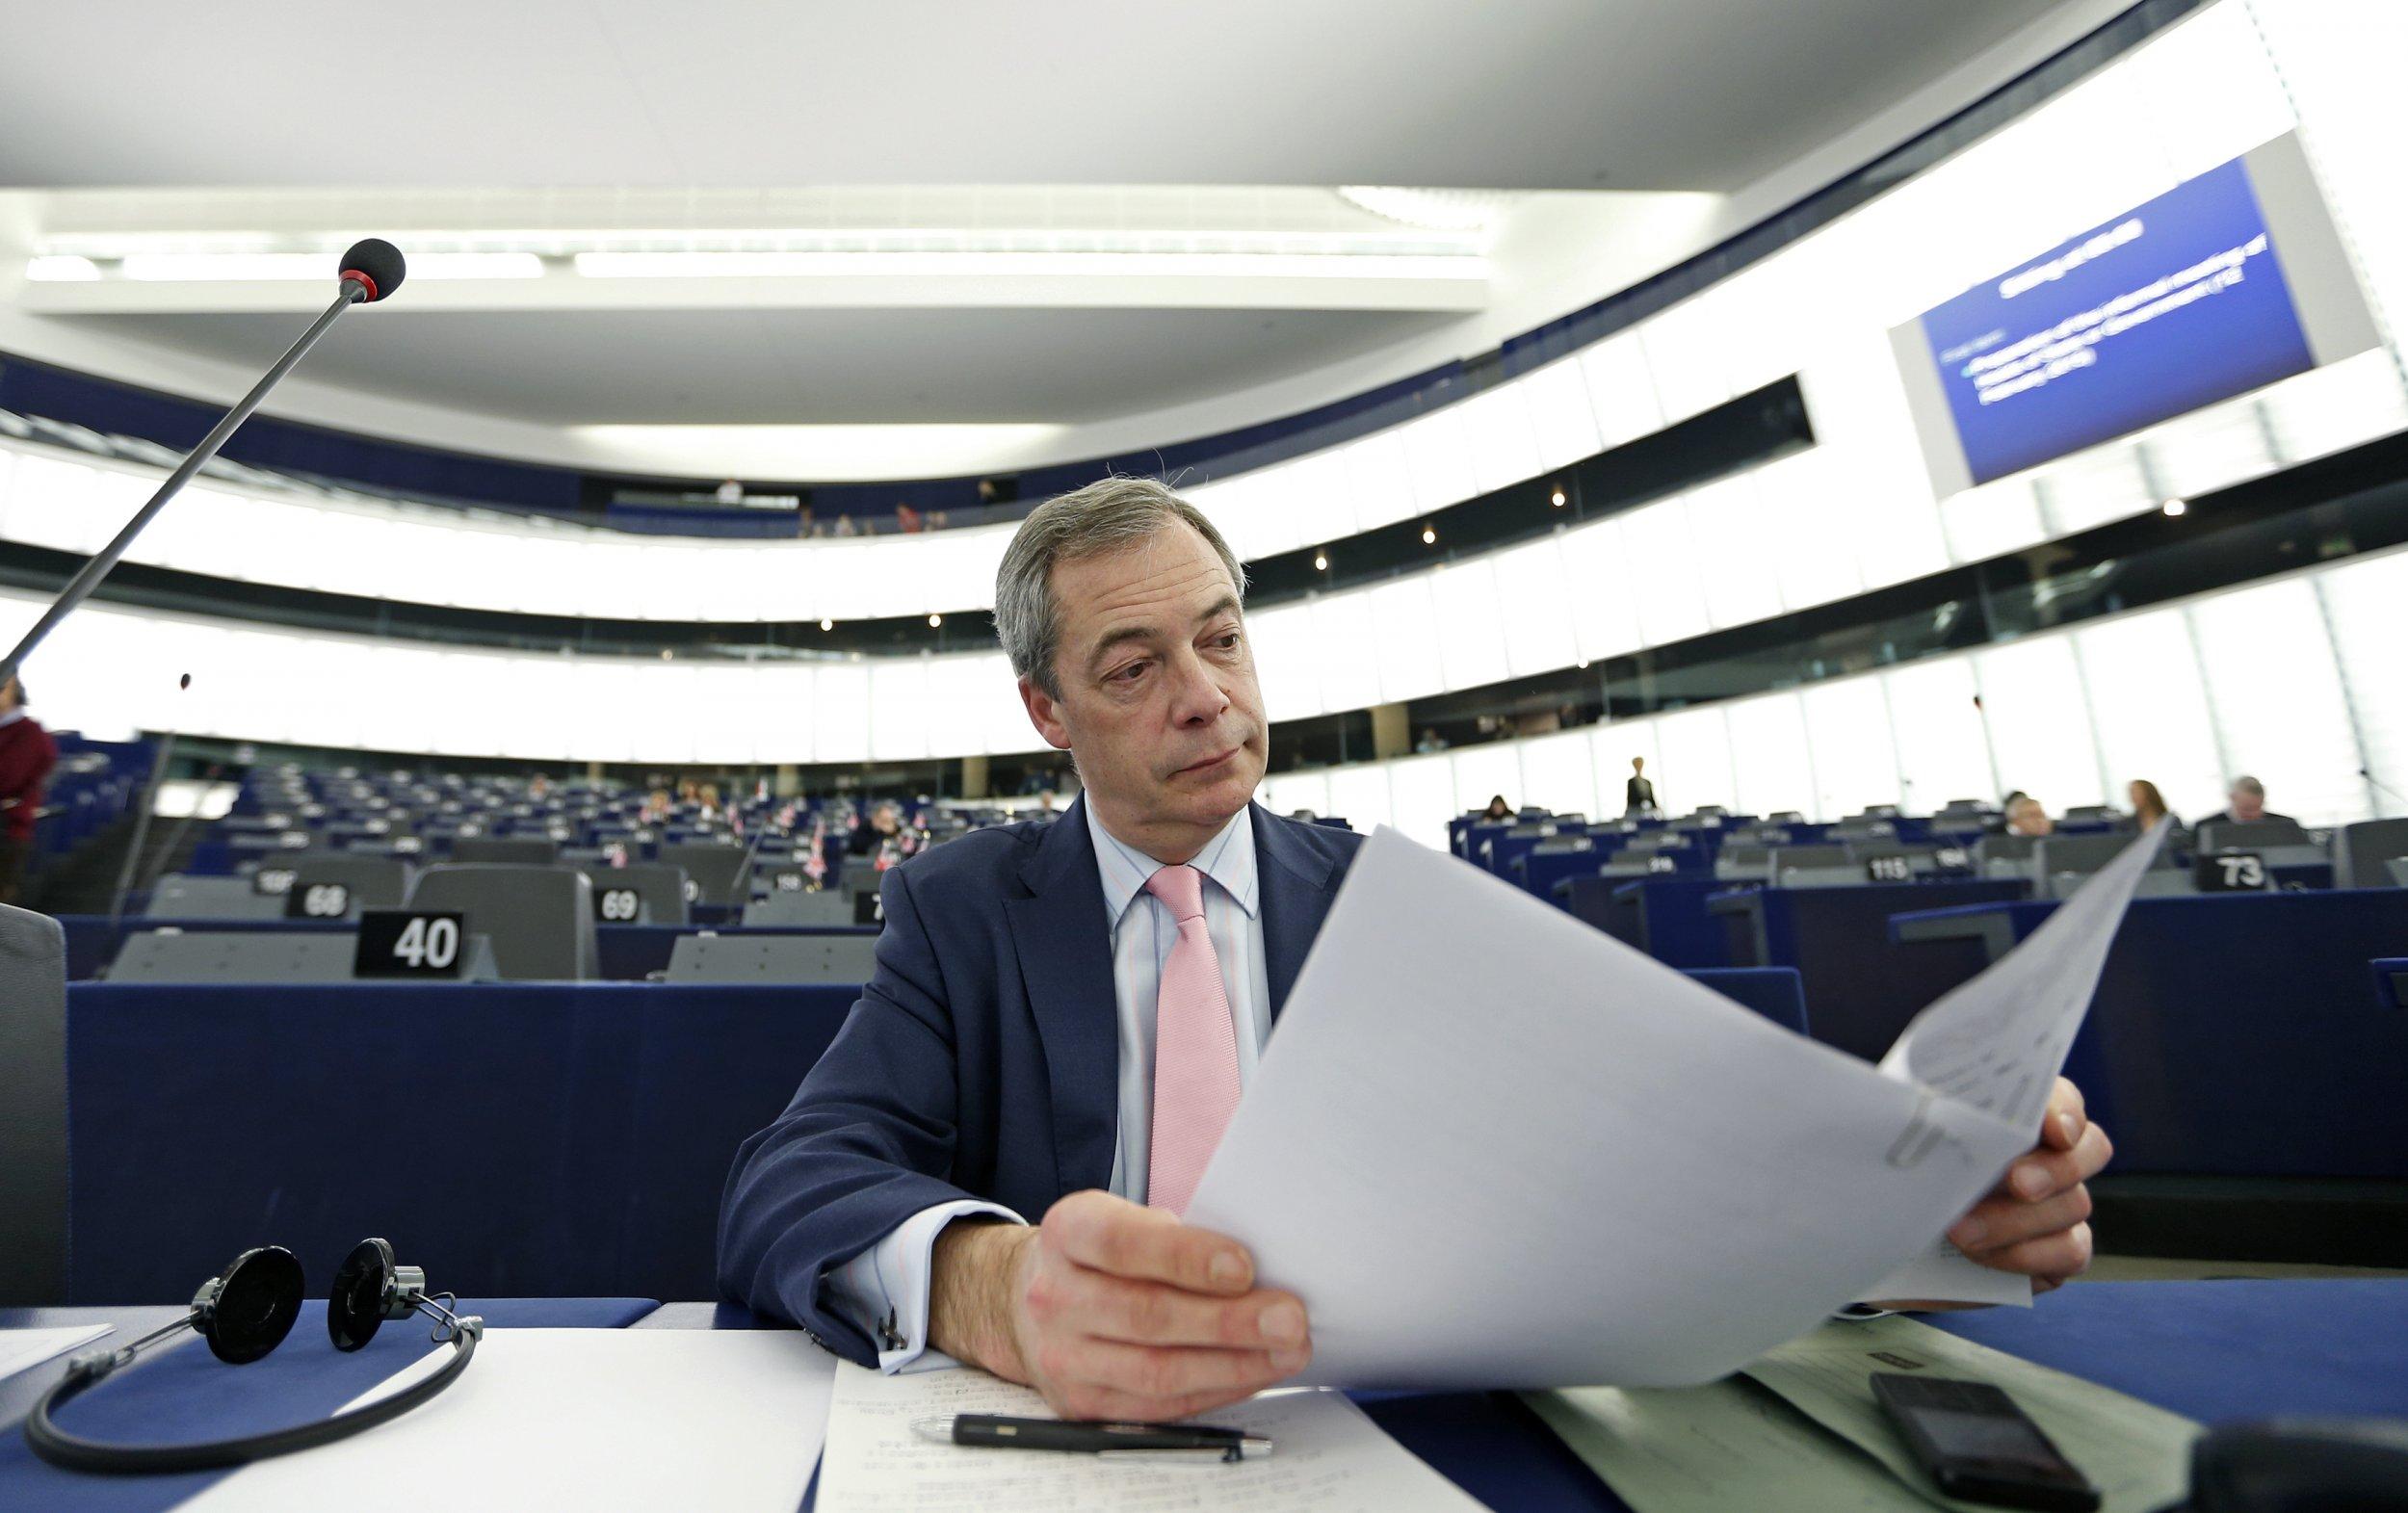 Farage and Ukip